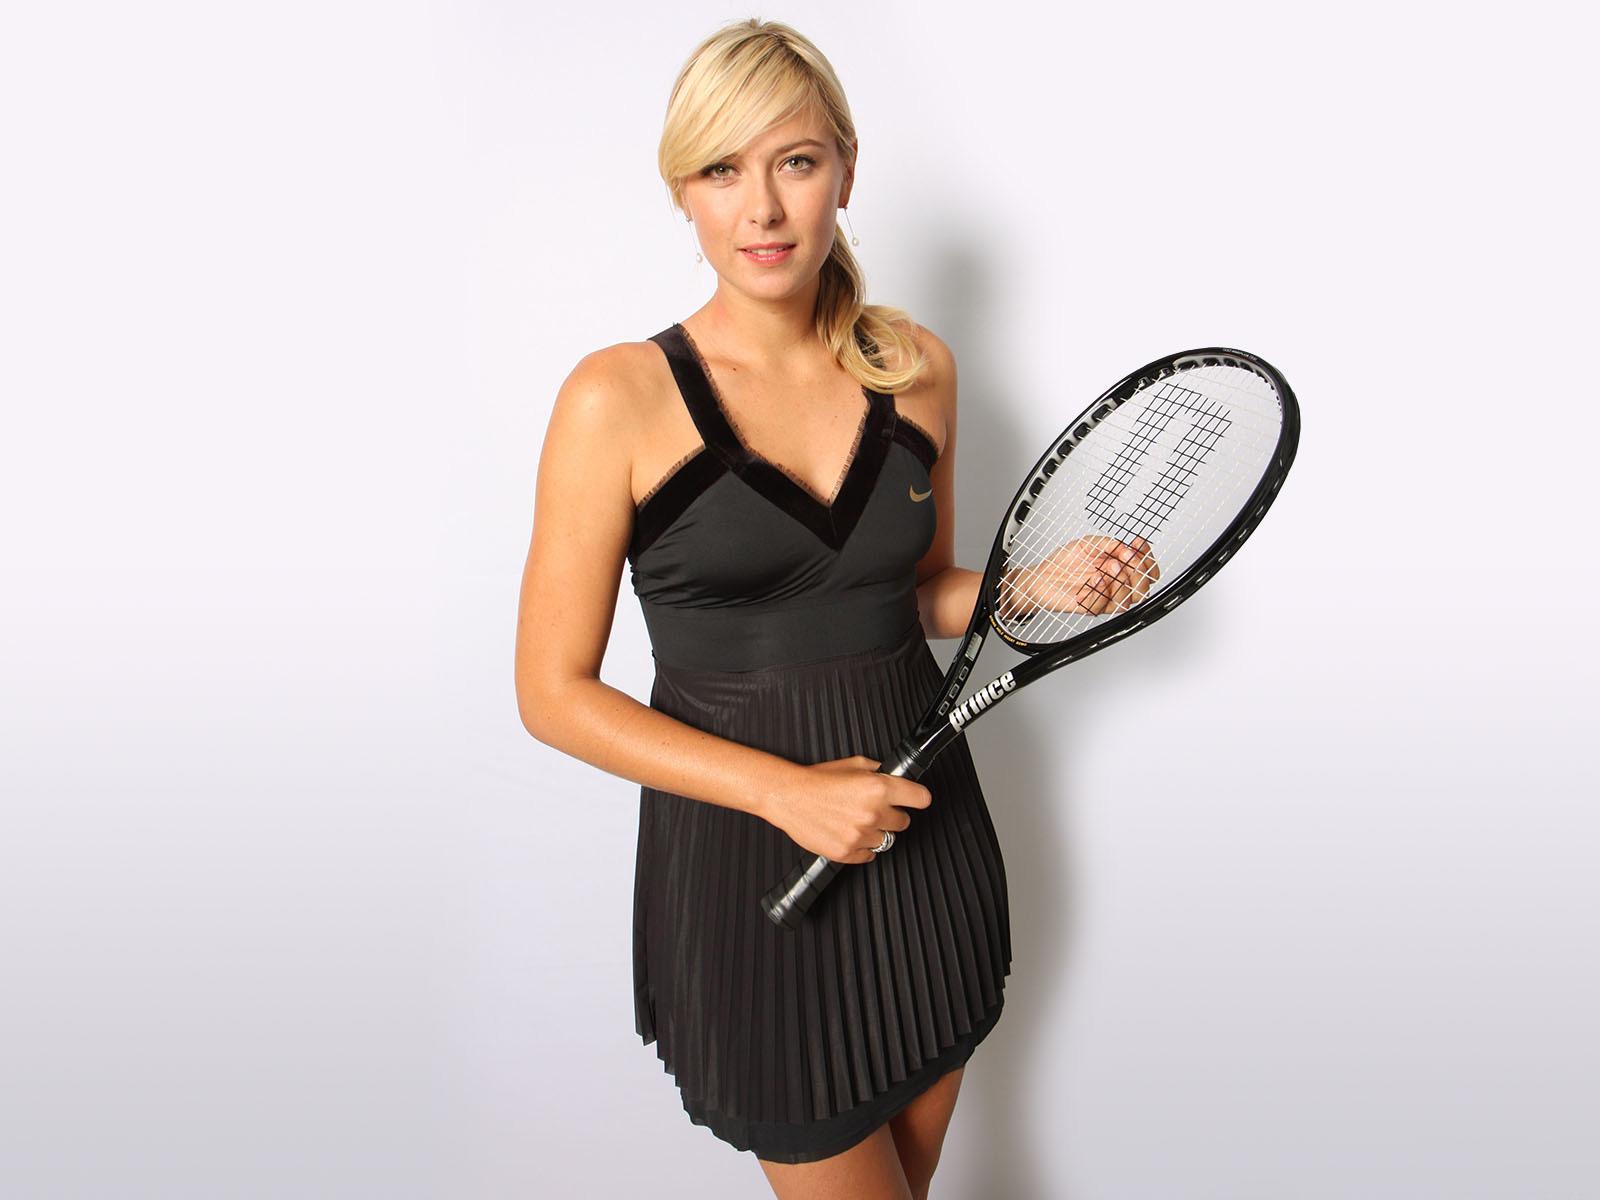 tennis player Maria Sharapova - age: 33